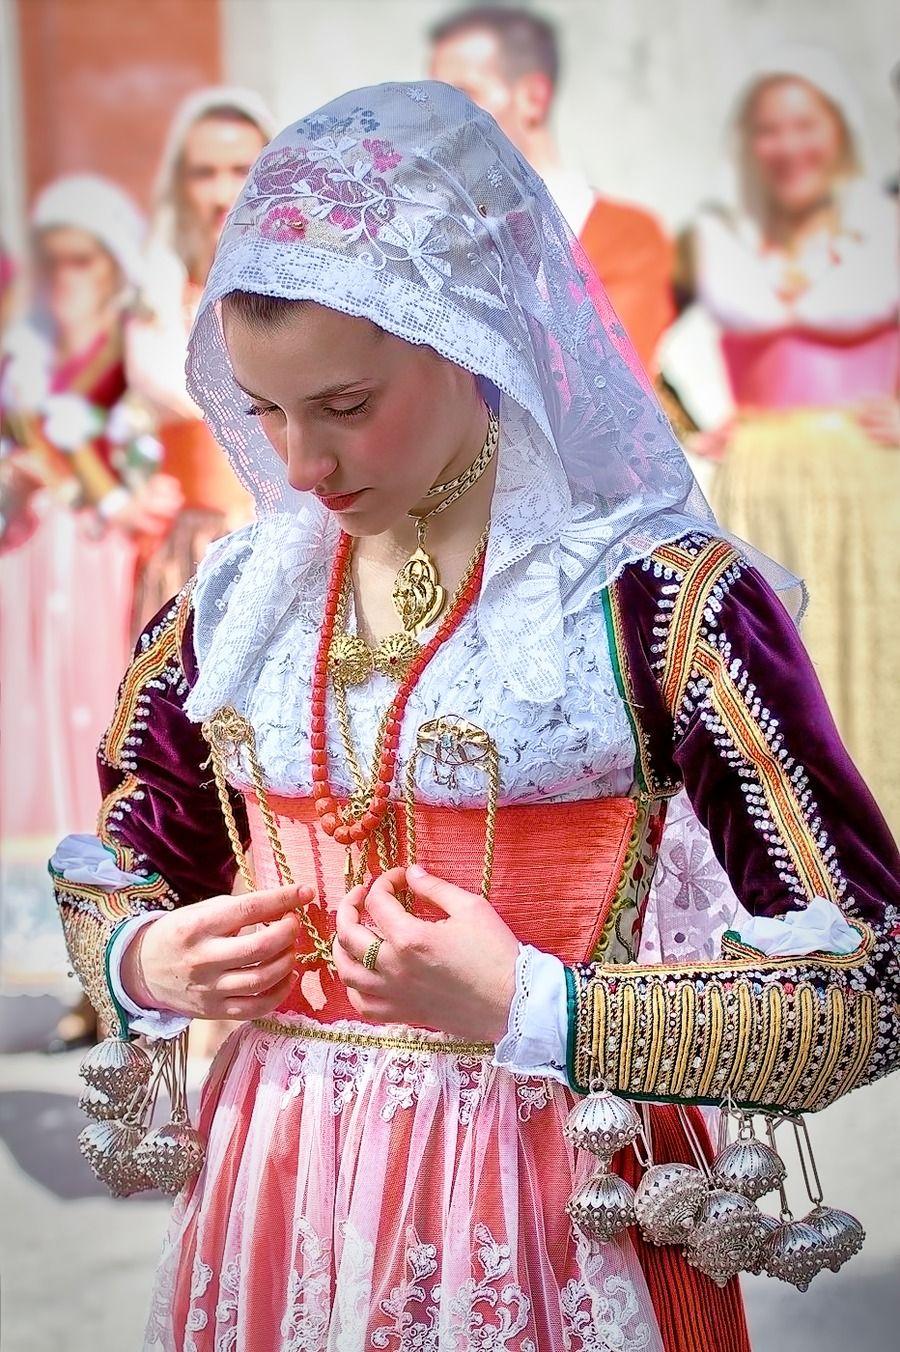 Traditional Costumes of Sardinia http://www.luxuryholidaysinsardinia.com/Blog/dettaglio/lifestyle-outdoor-un-mondo-di-opportunita-per-vivere-la-sardegna